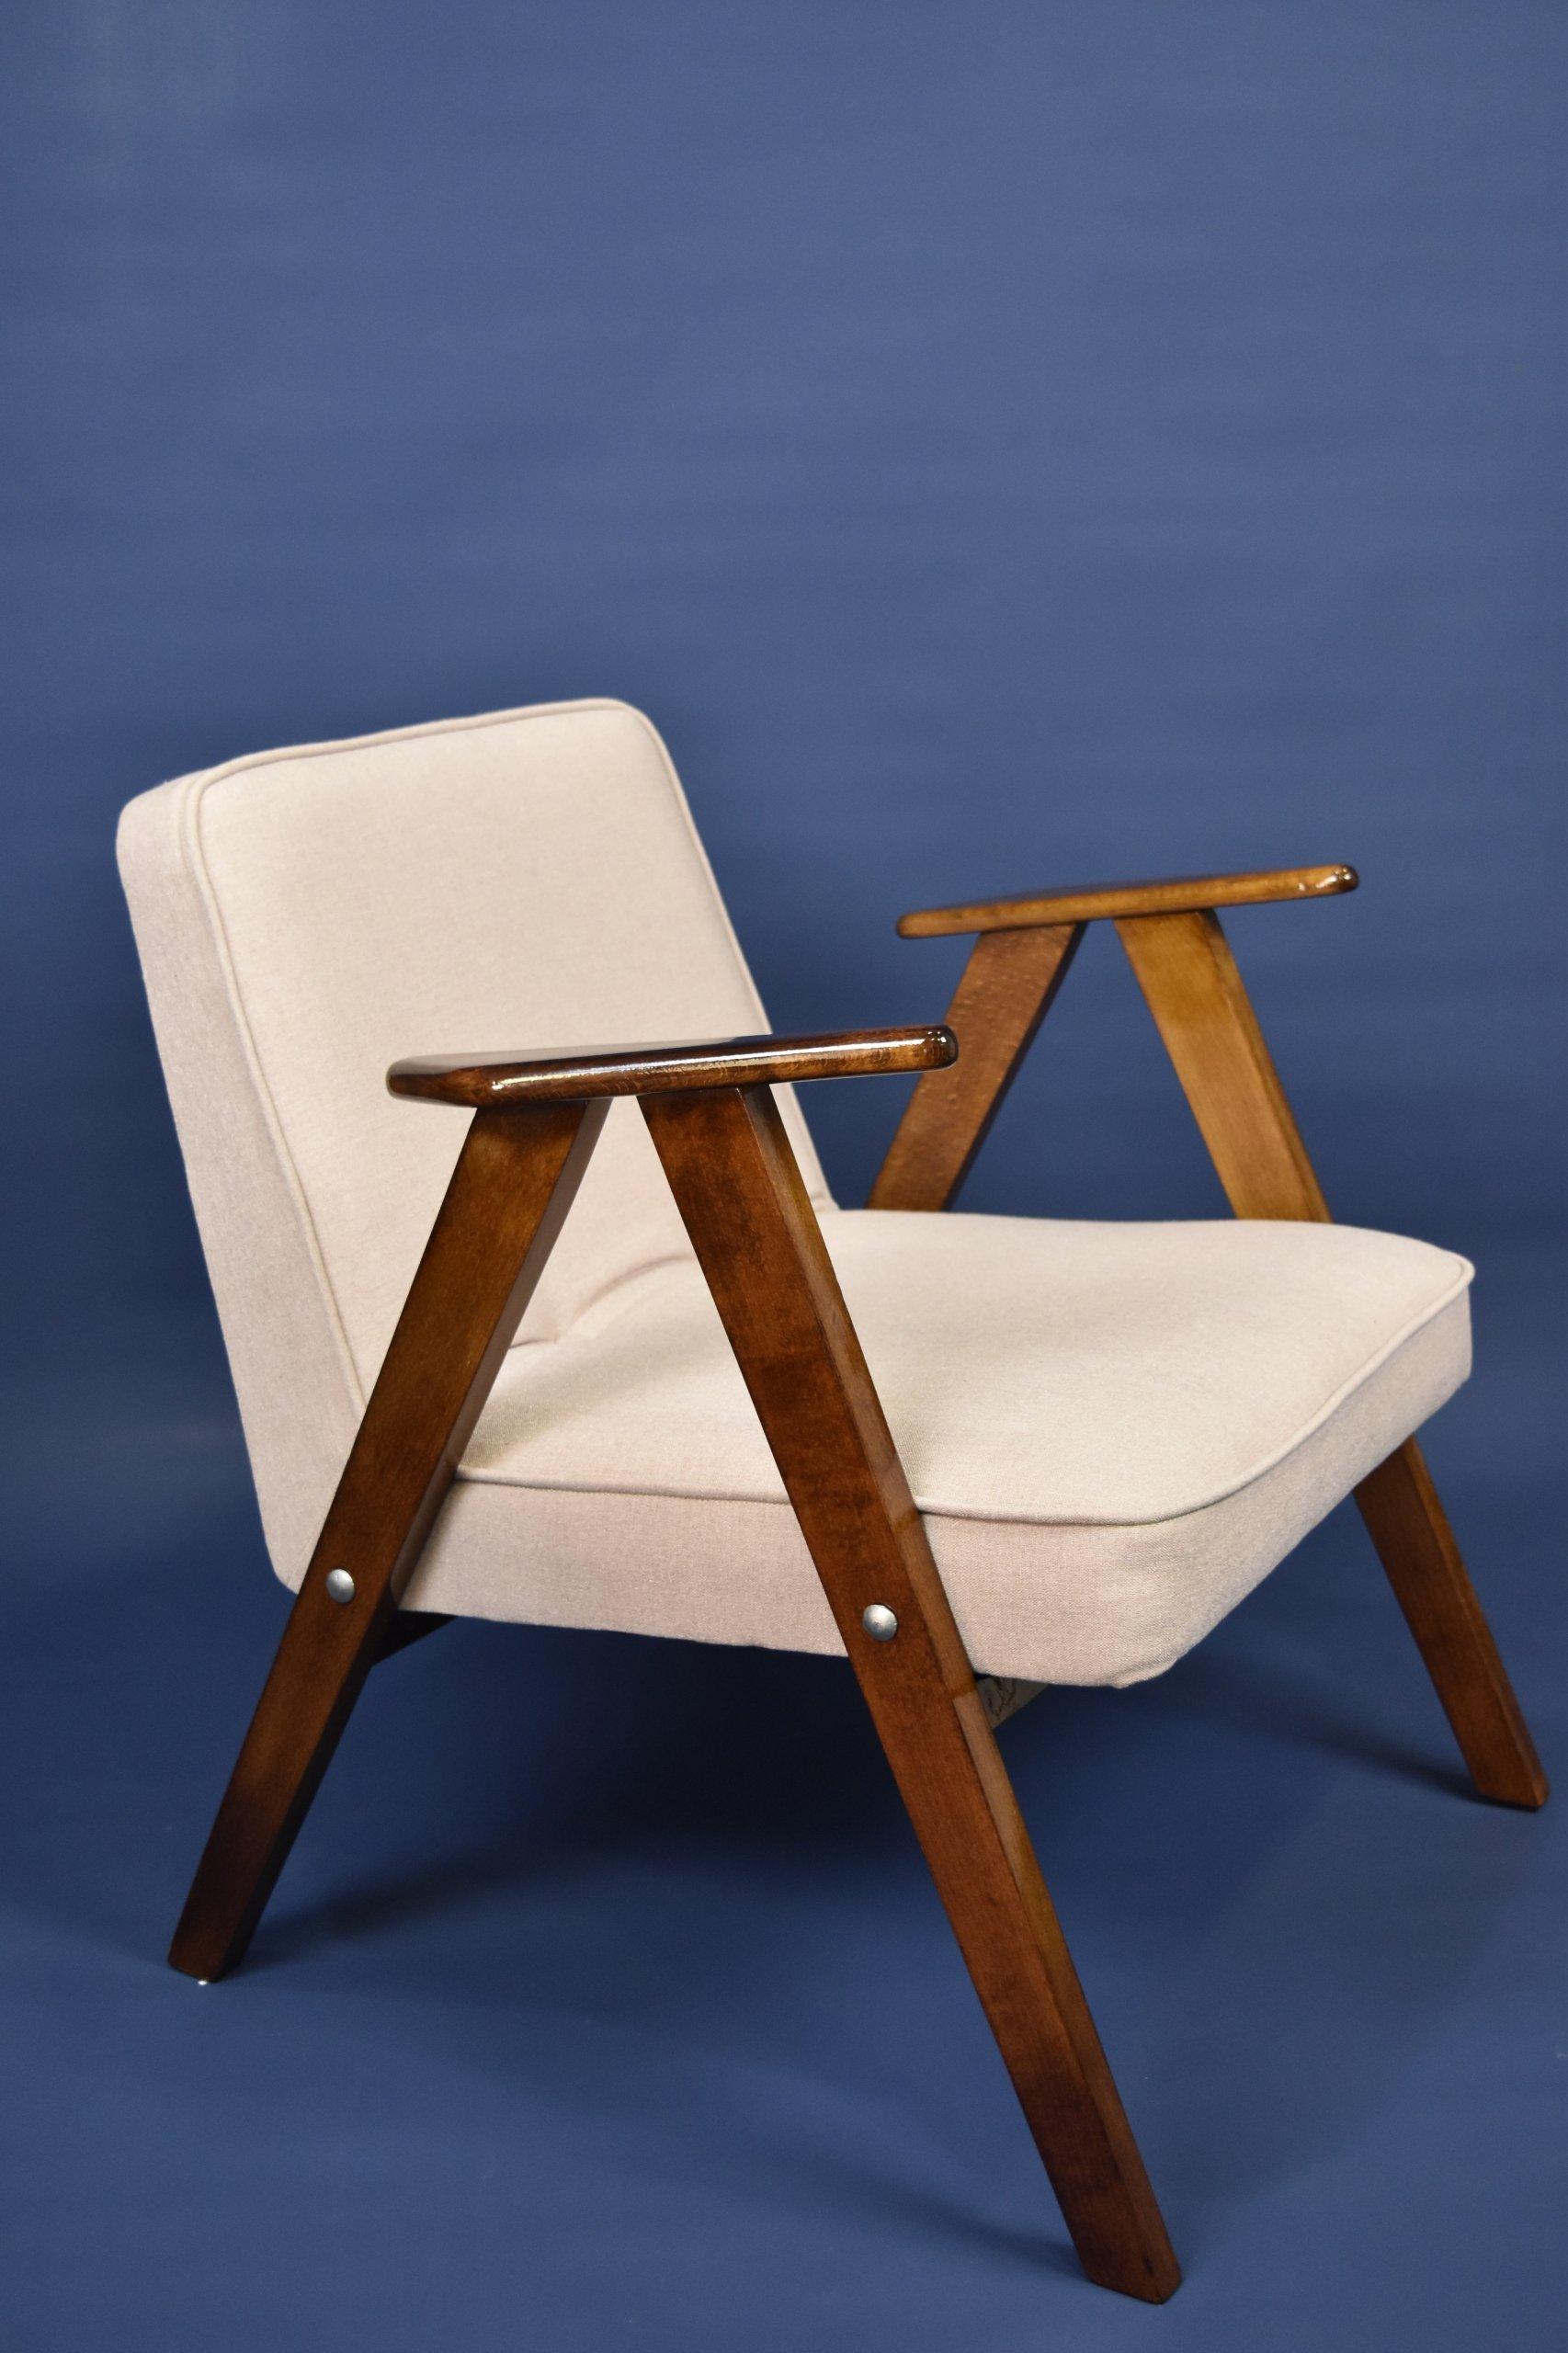 Fotel 364 Polska Prl Lata 60 Chierowski Brat 366